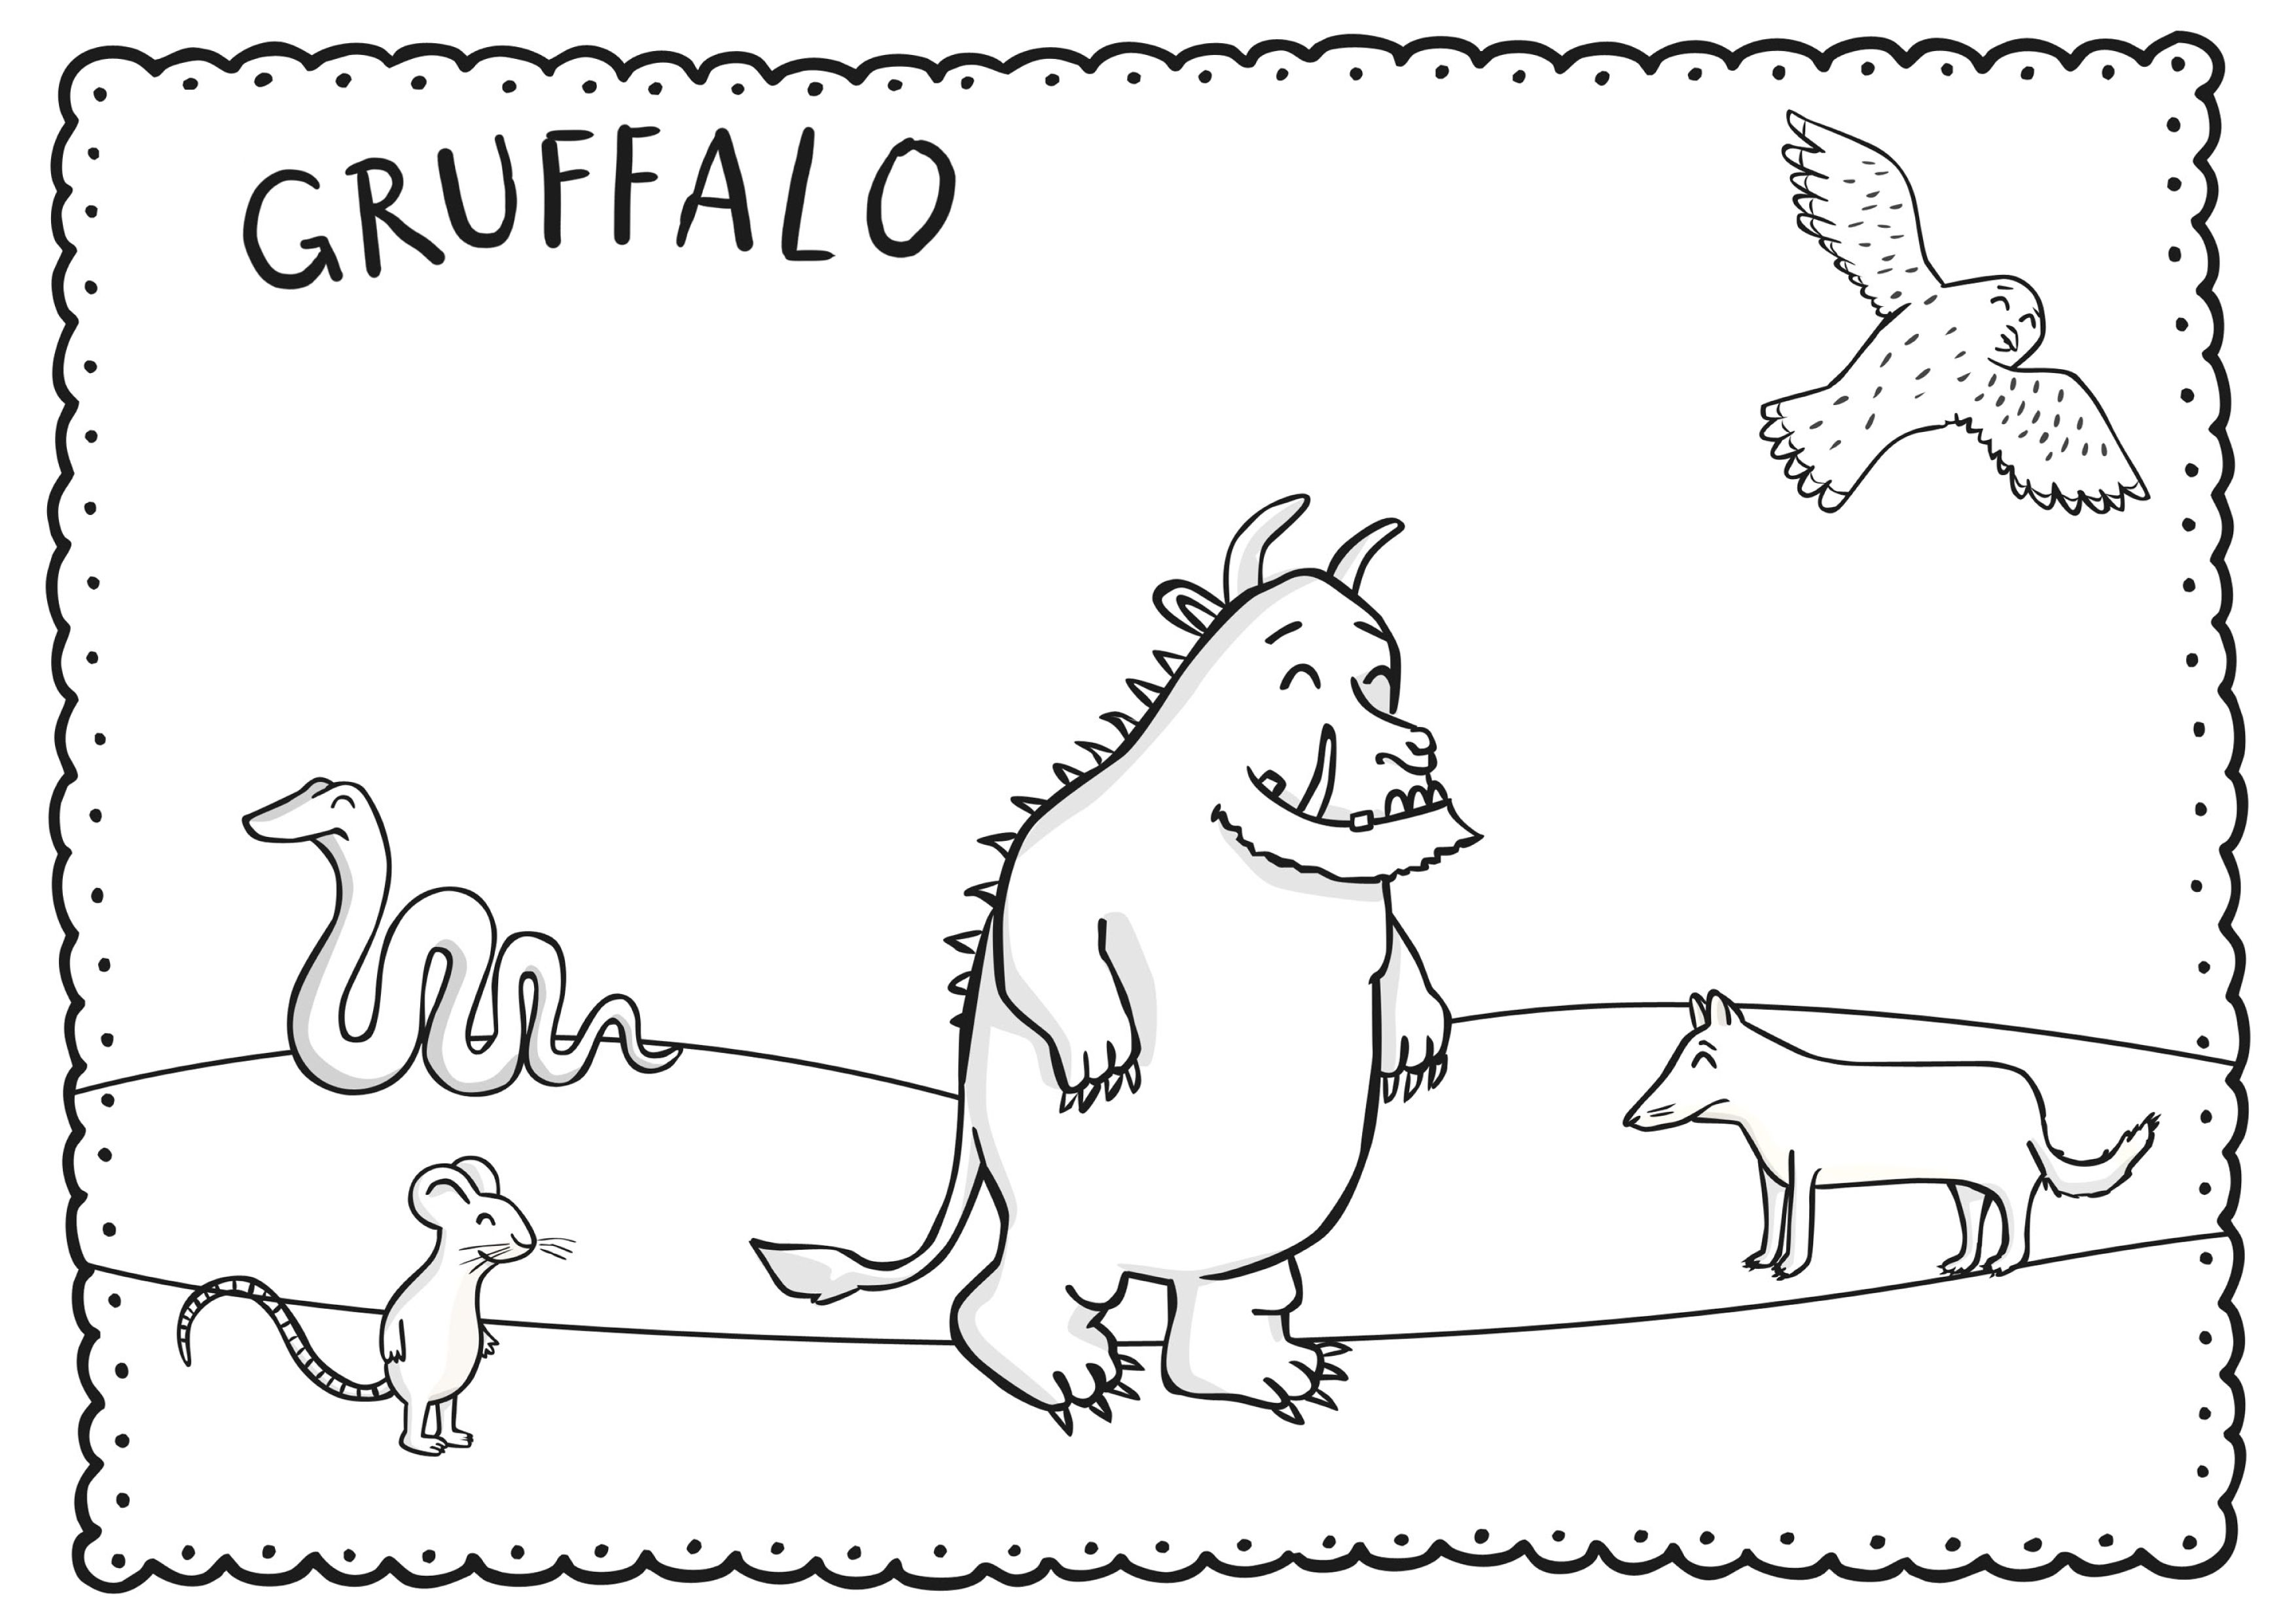 Kleurplaat De Gruffalo Gruffalo